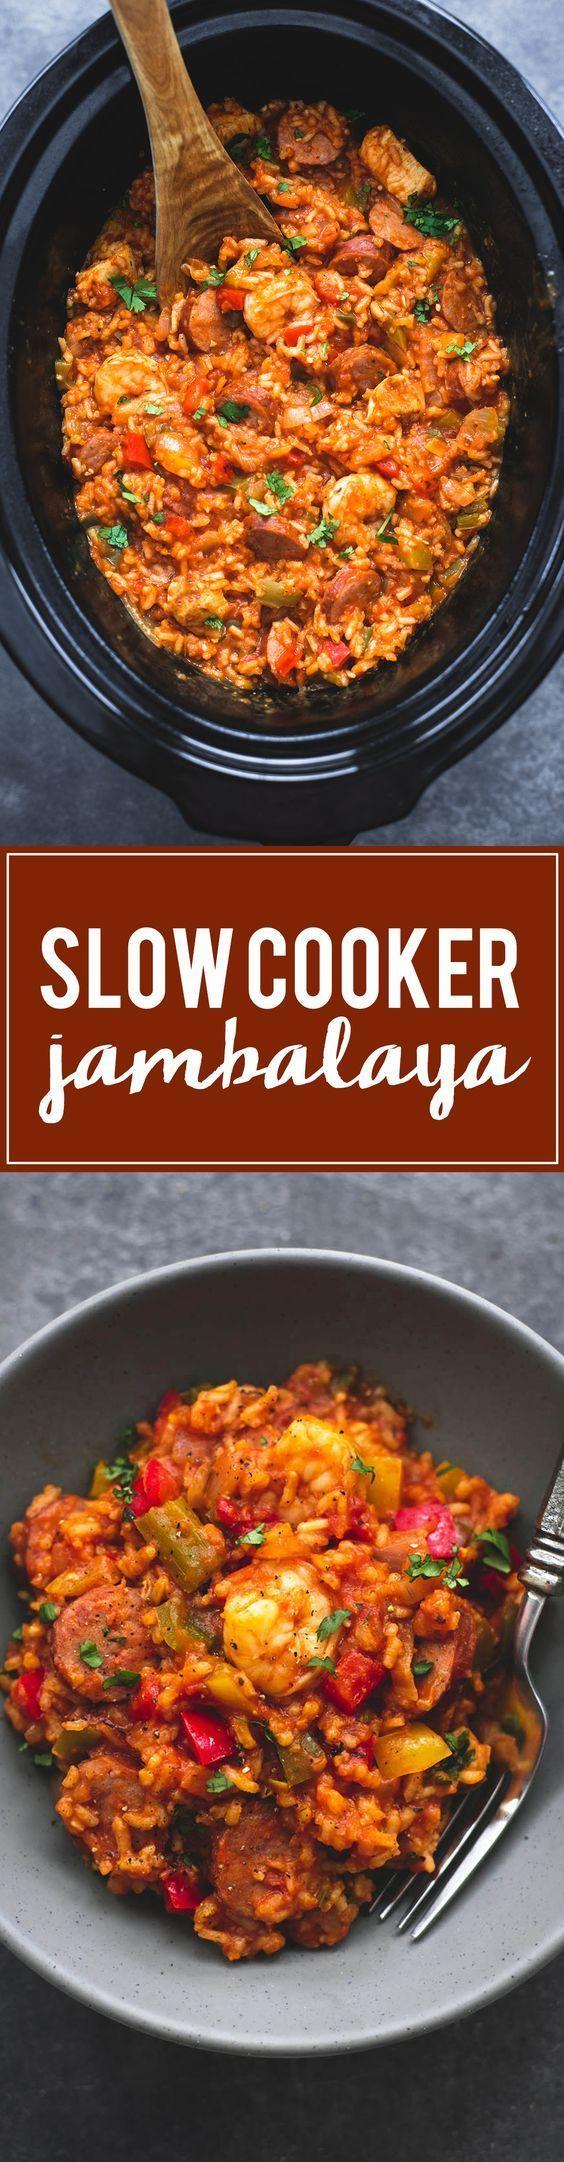 Slow Cooker Jambalaya | http://lecremedelacrumb.com